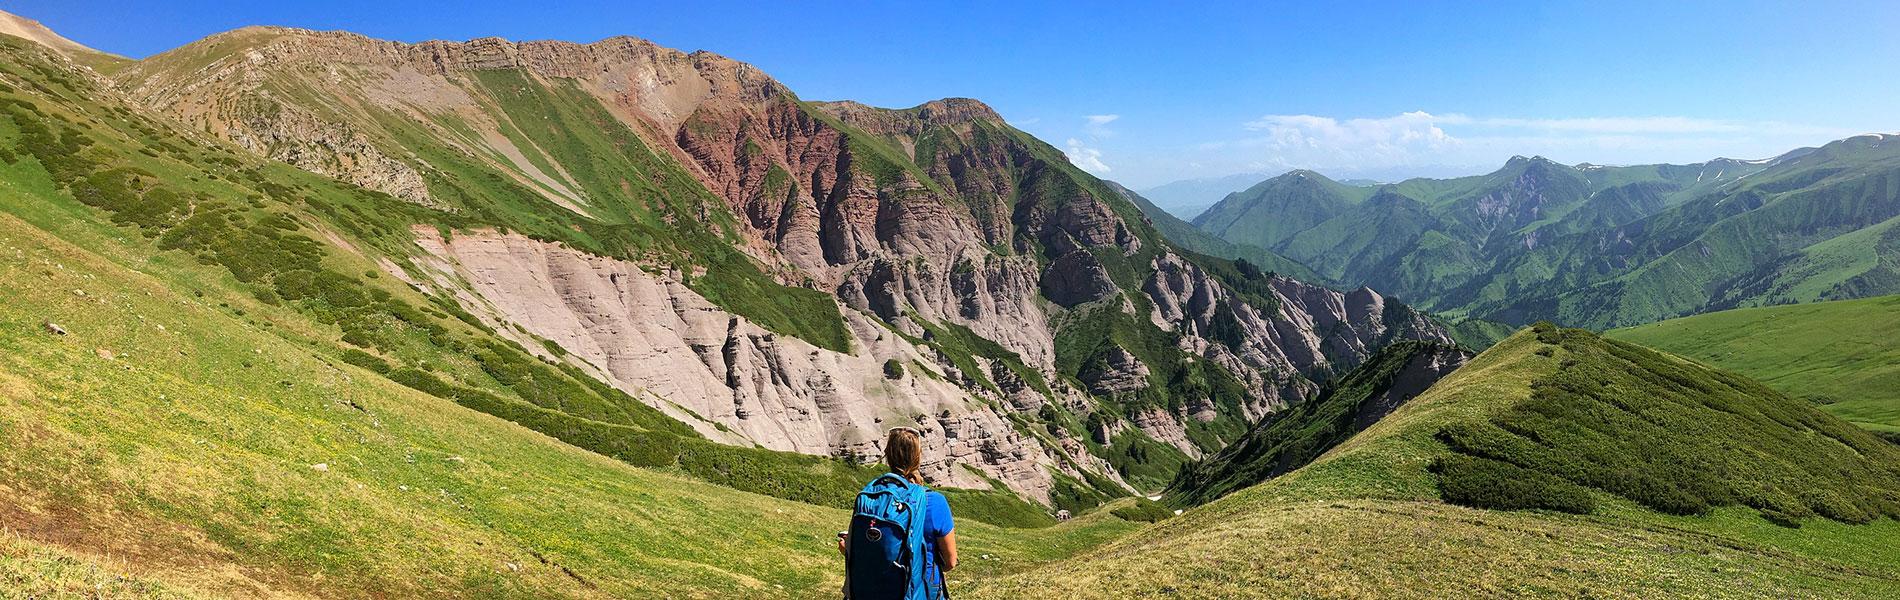 tours in Kyrgyzstan